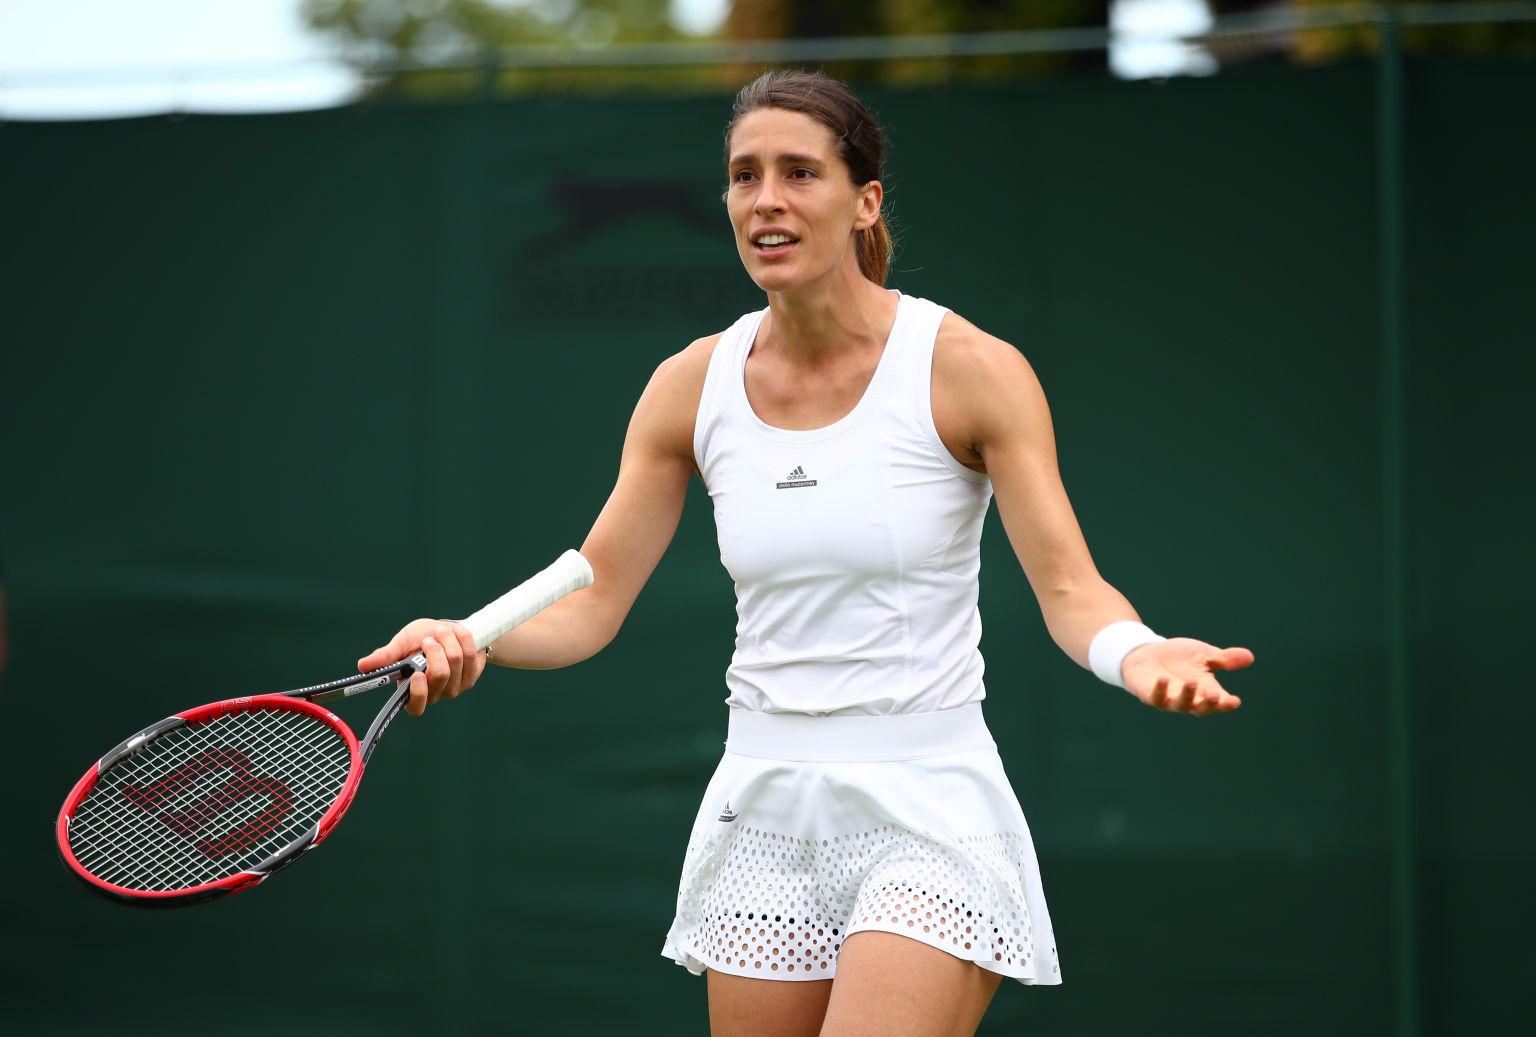 Andrea Petkovic unterlag der Russin Elena Vesnina